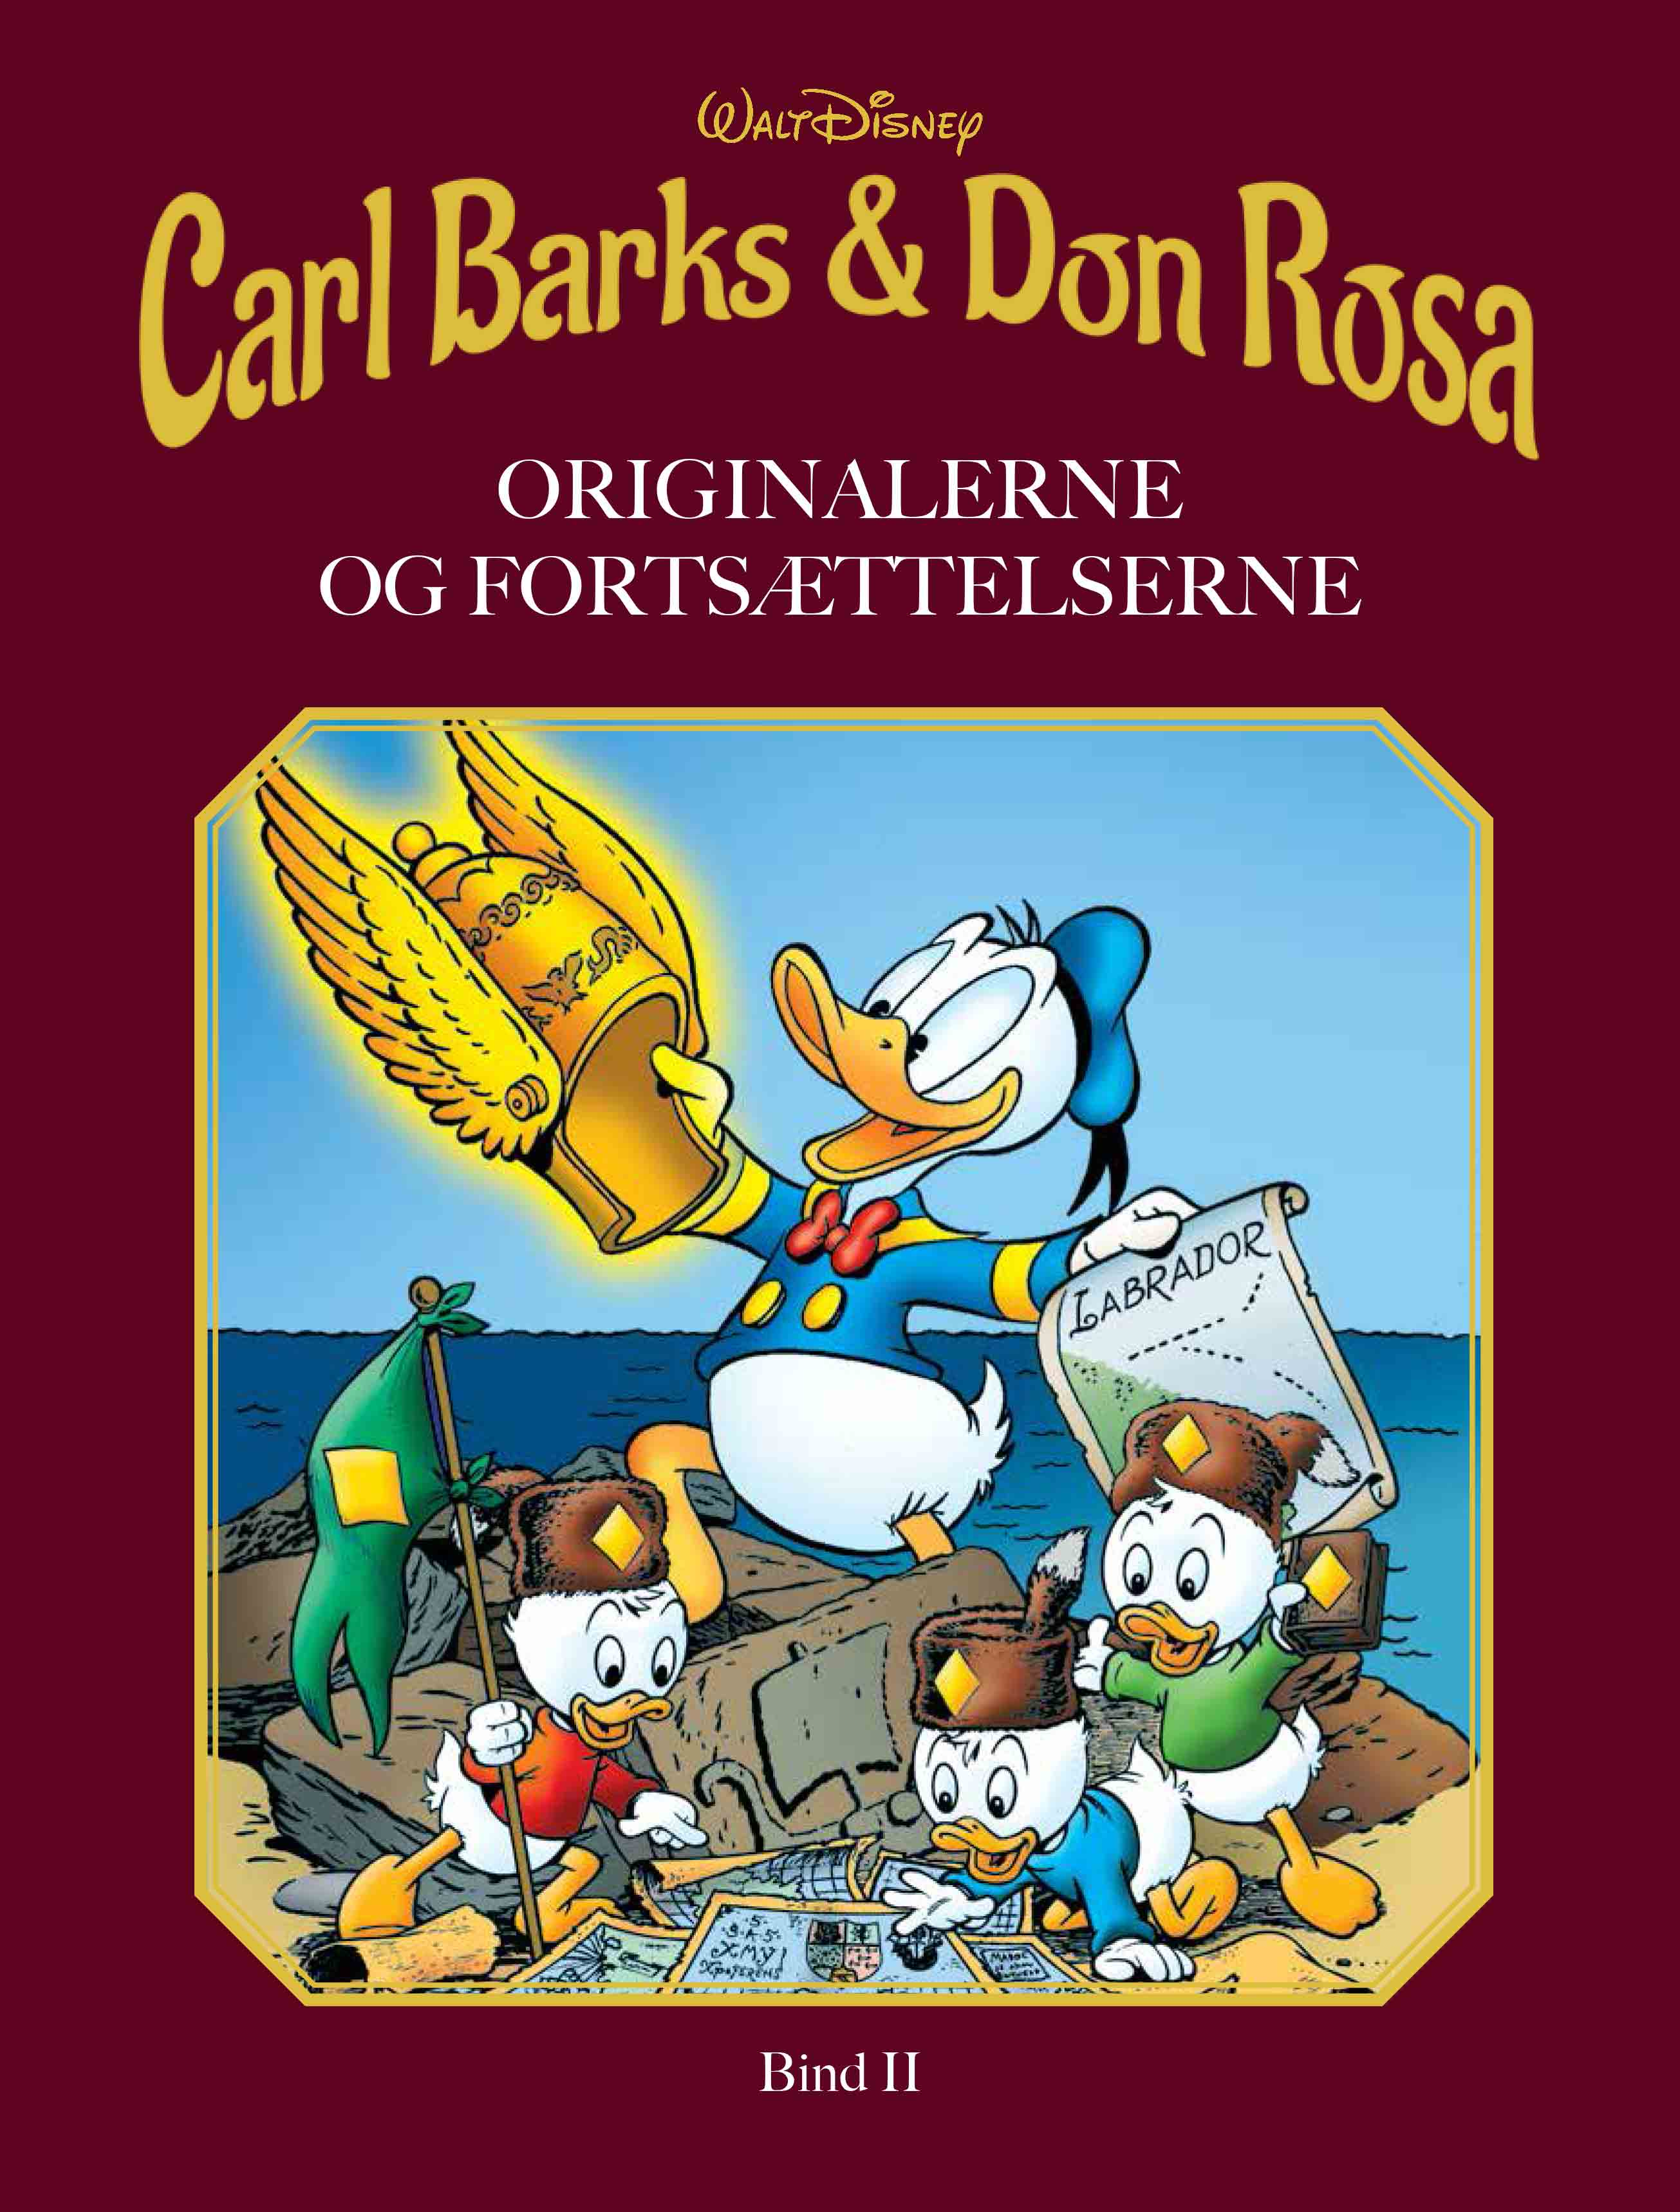 Carl Barks & Don Rosa - Disney - Bøger - Egmont Publishing A/S - 9788793840218 - 21/9-2020